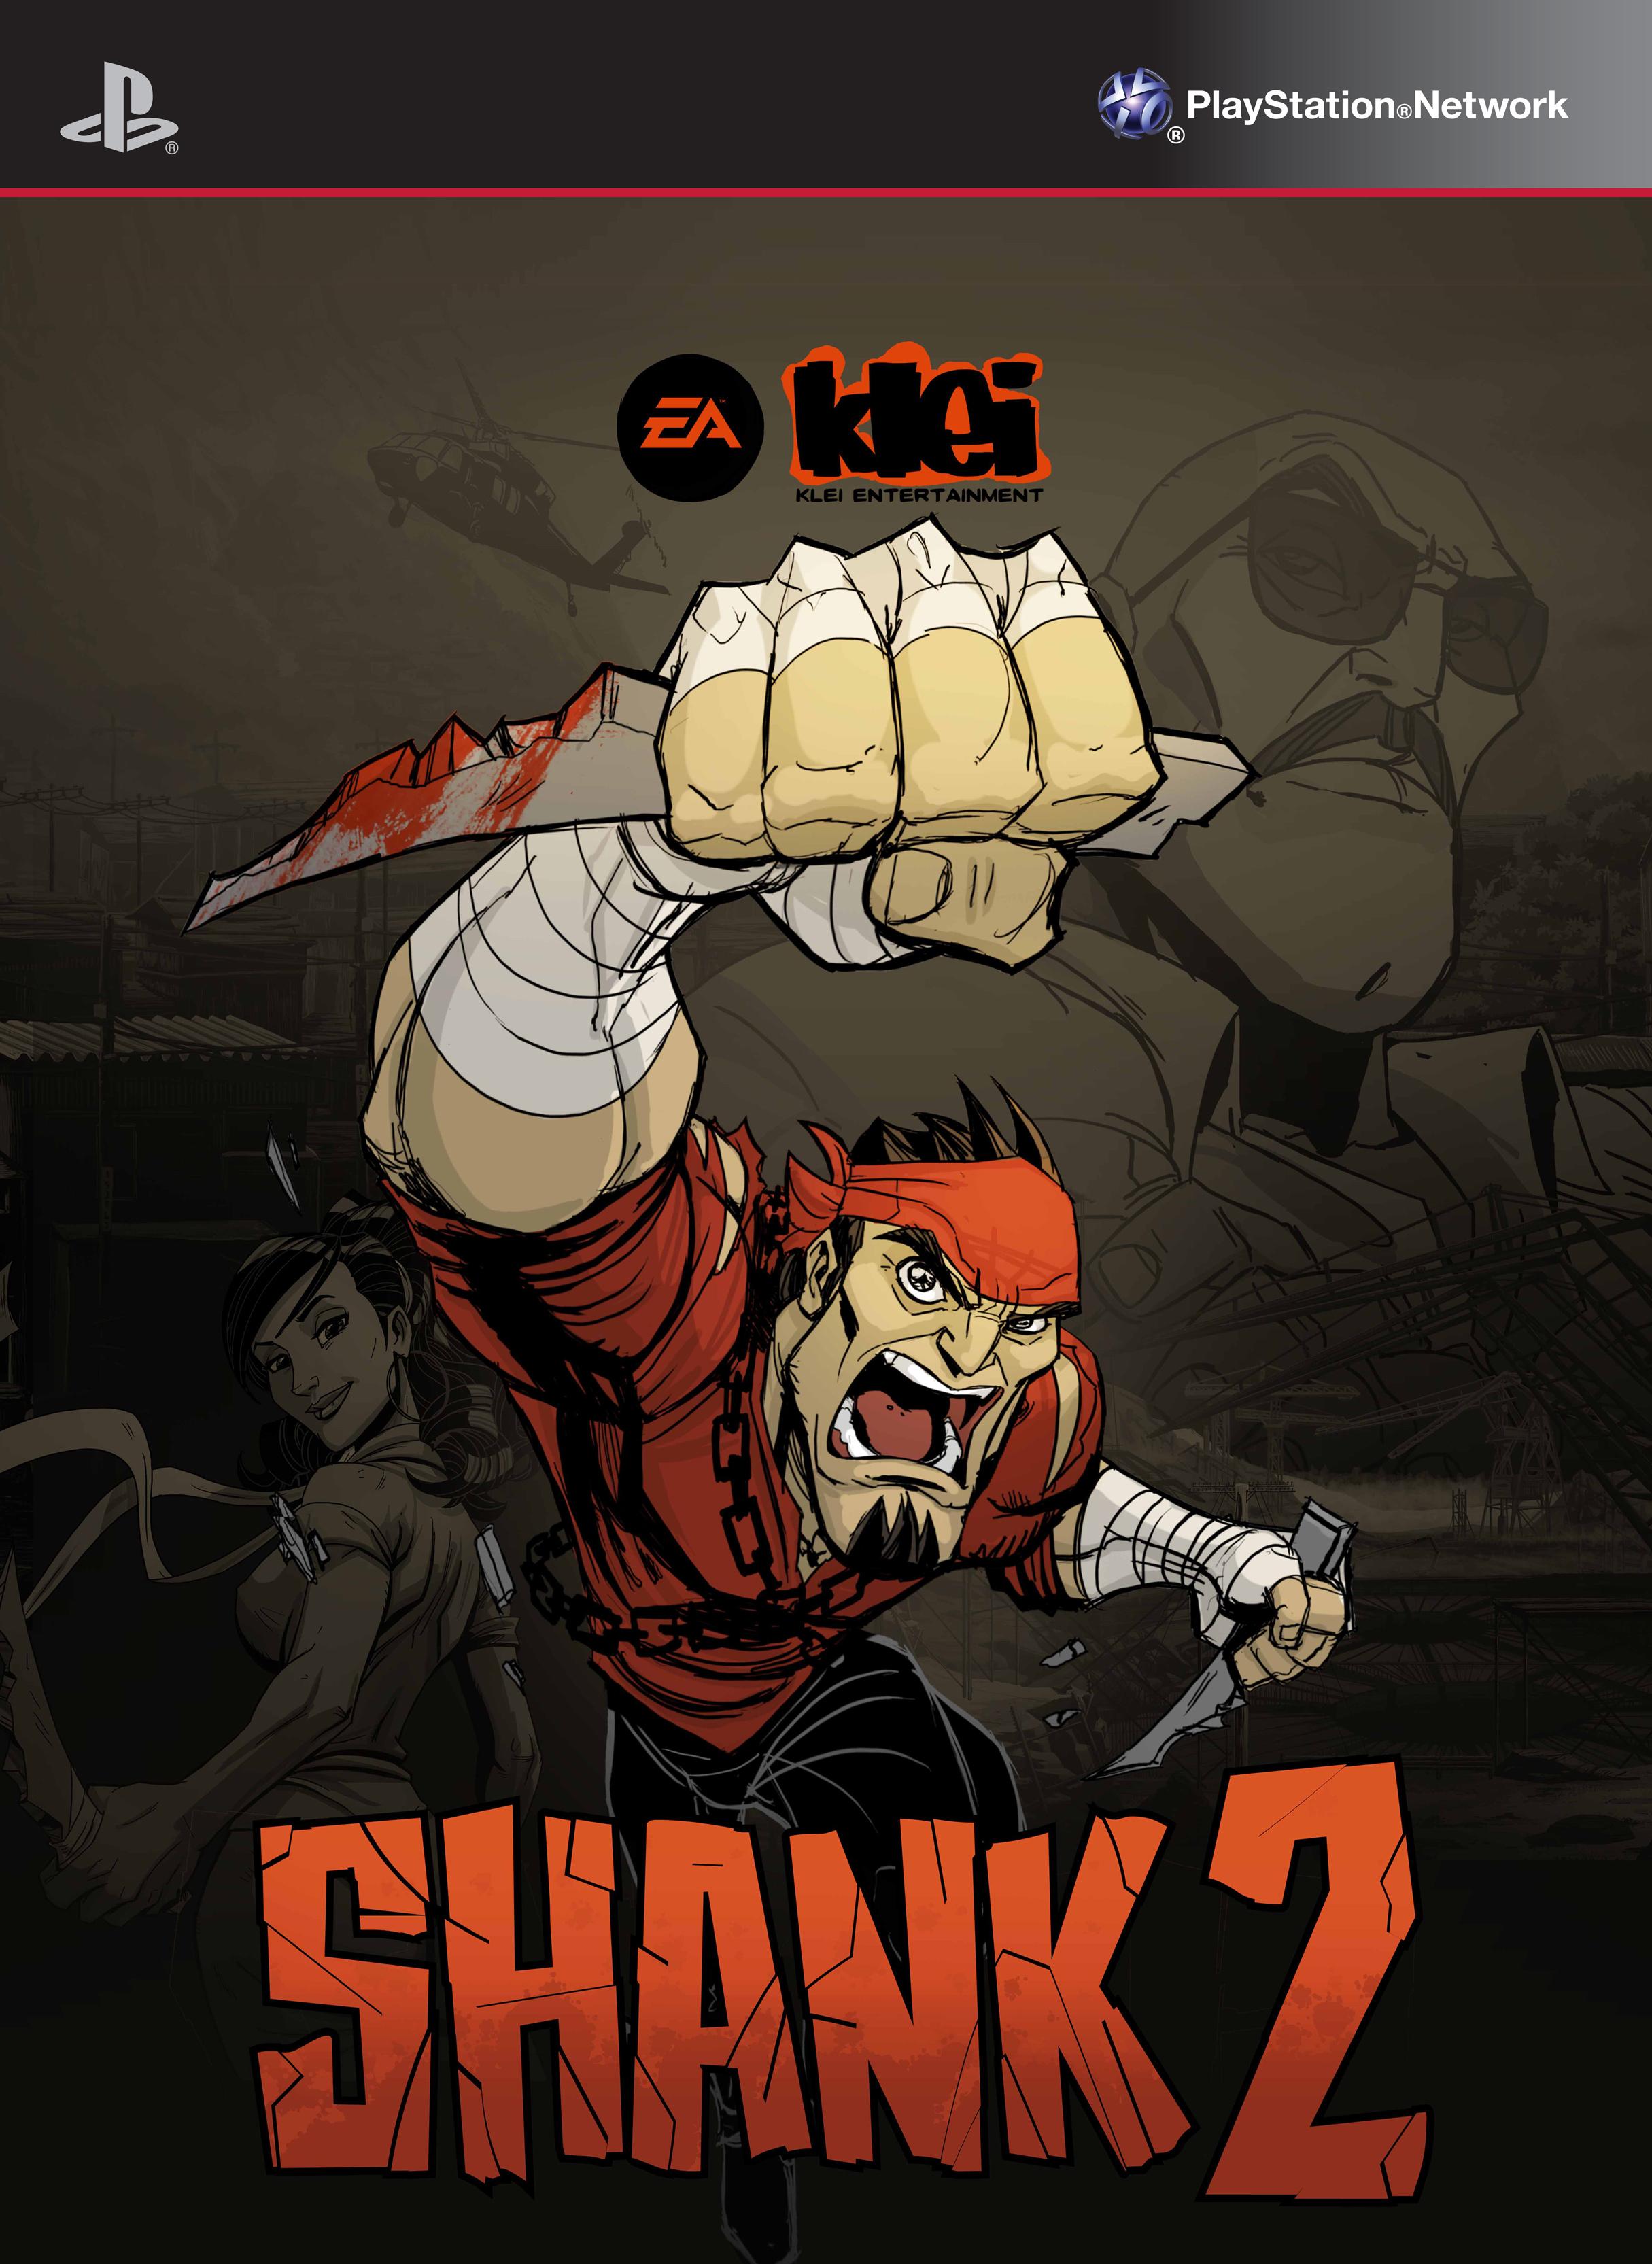 Shank 2 PlayStation 3